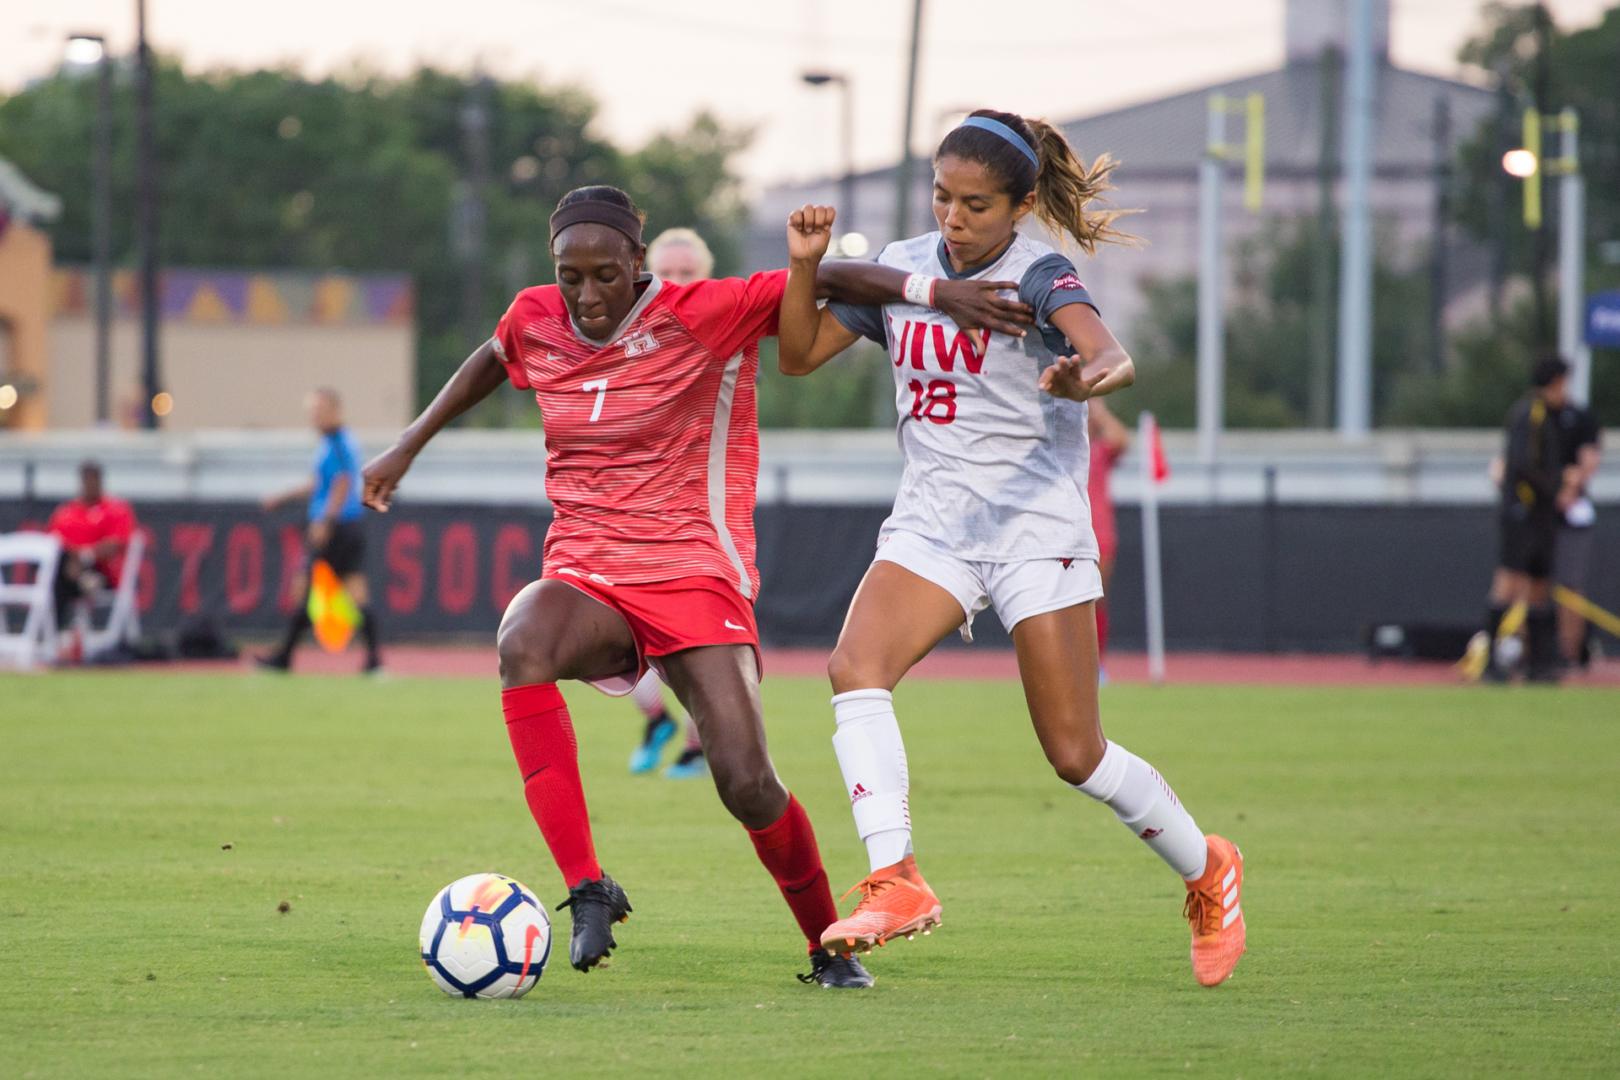 Senior forward Desiree Bowen scored the lone goal in Houston's 2-1 overtime defeat. | File photo